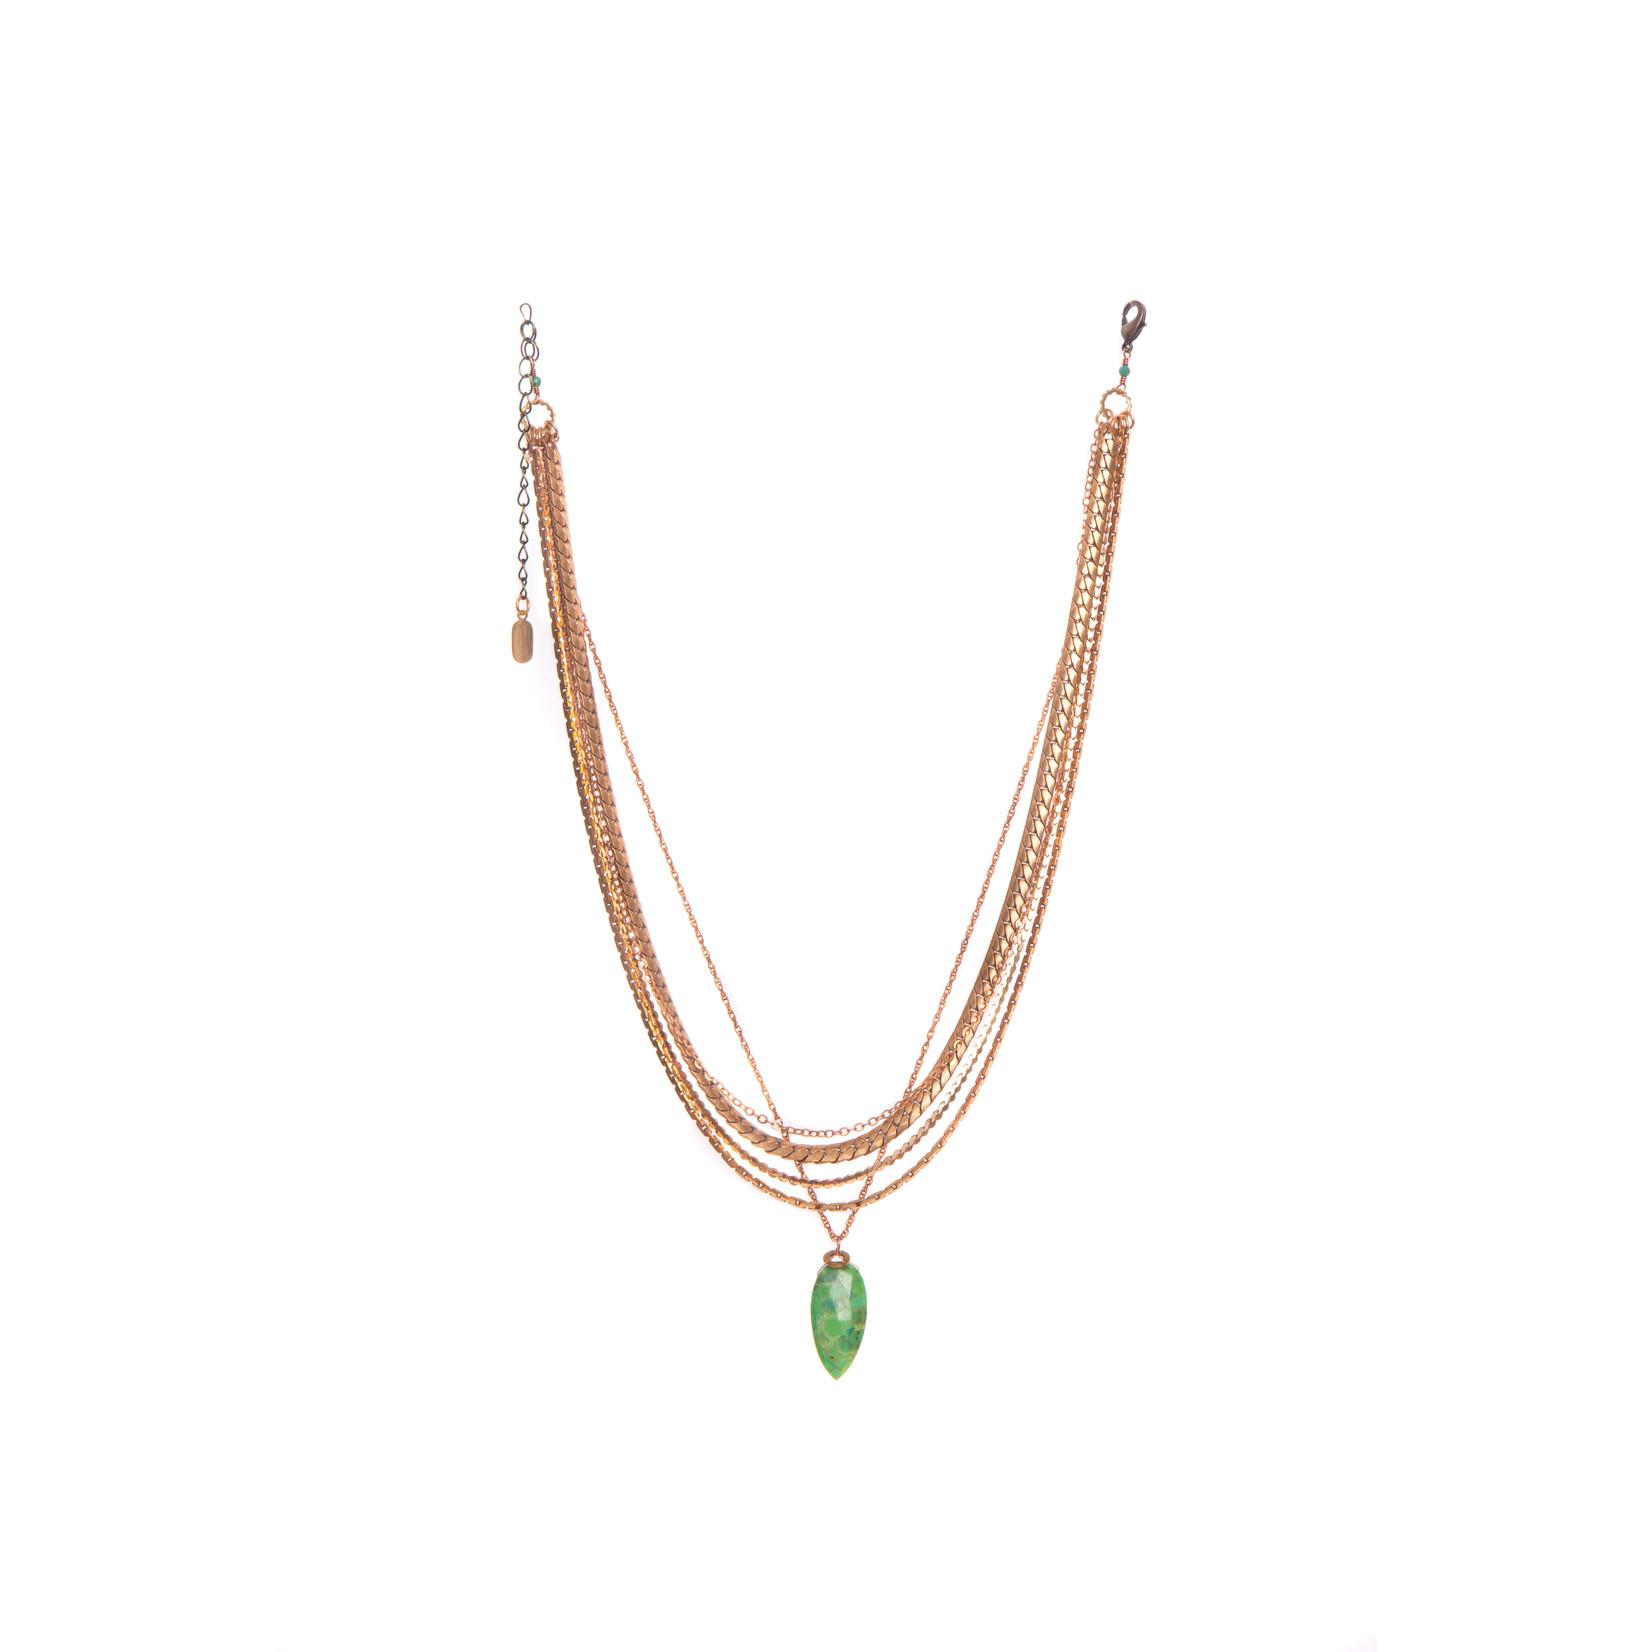 Hailey Gerrits Amazon Necklace